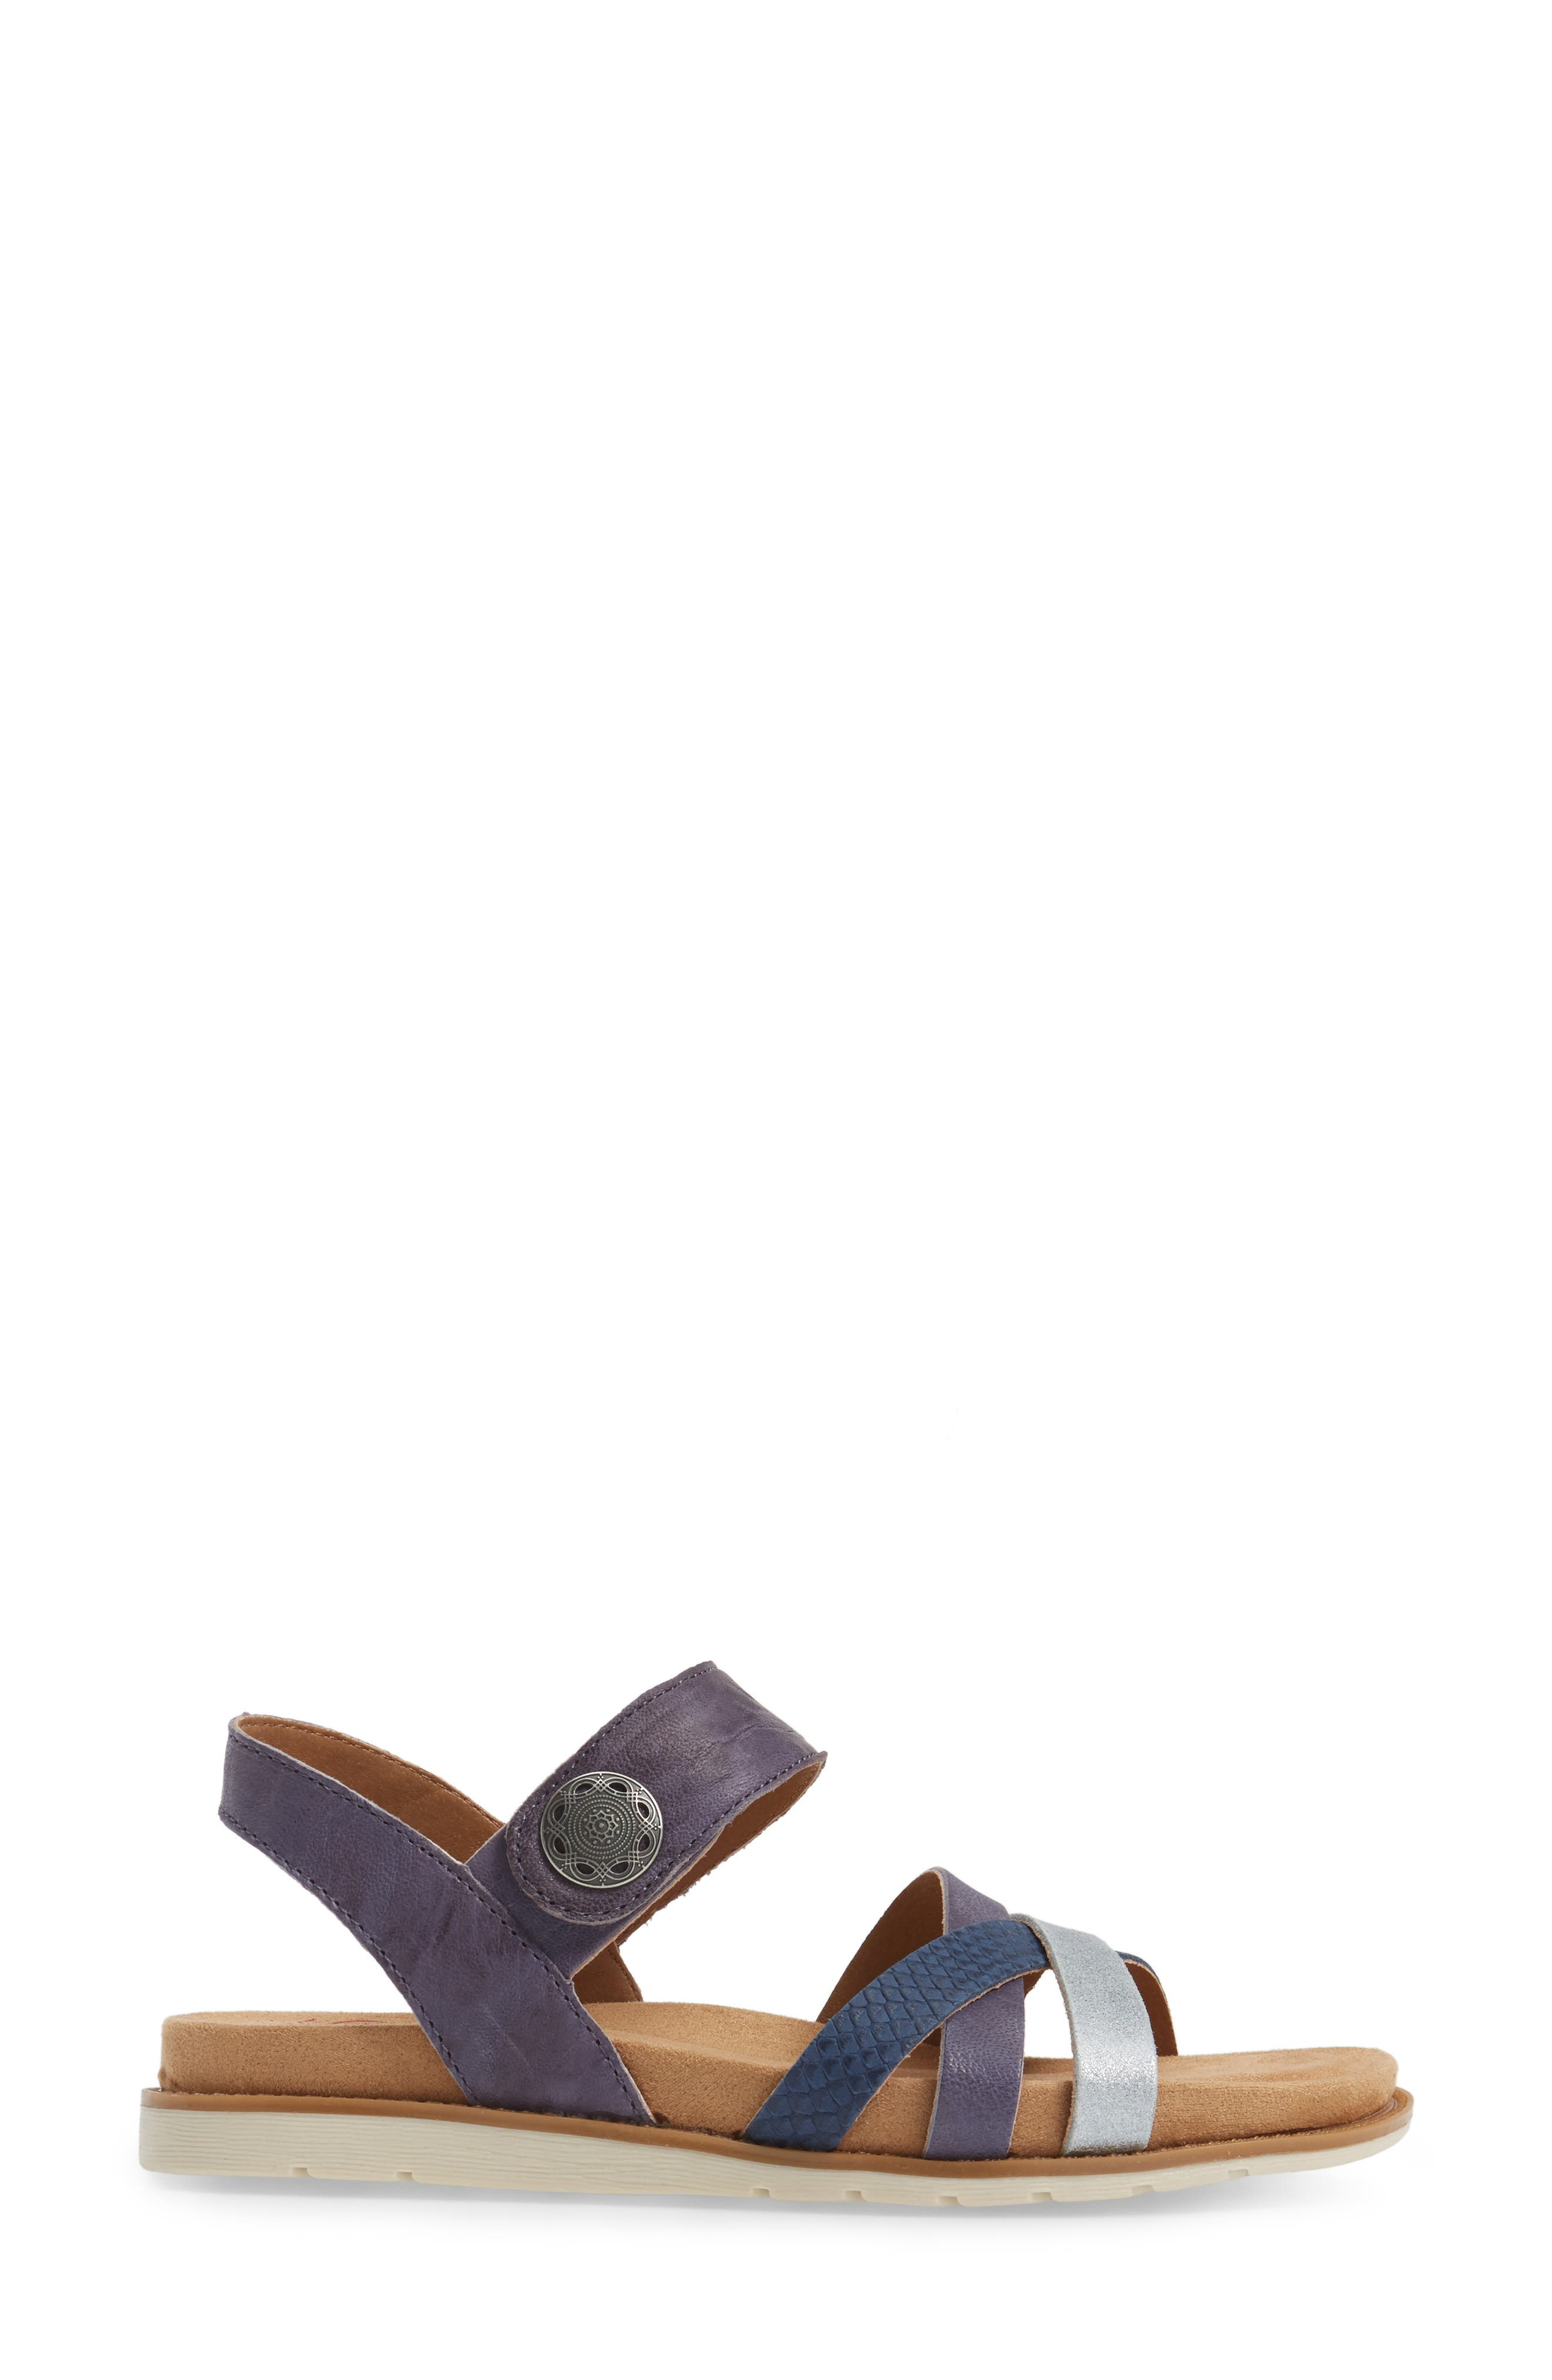 Alonsa Sandal,                             Alternate thumbnail 3, color,                             Denim Leather